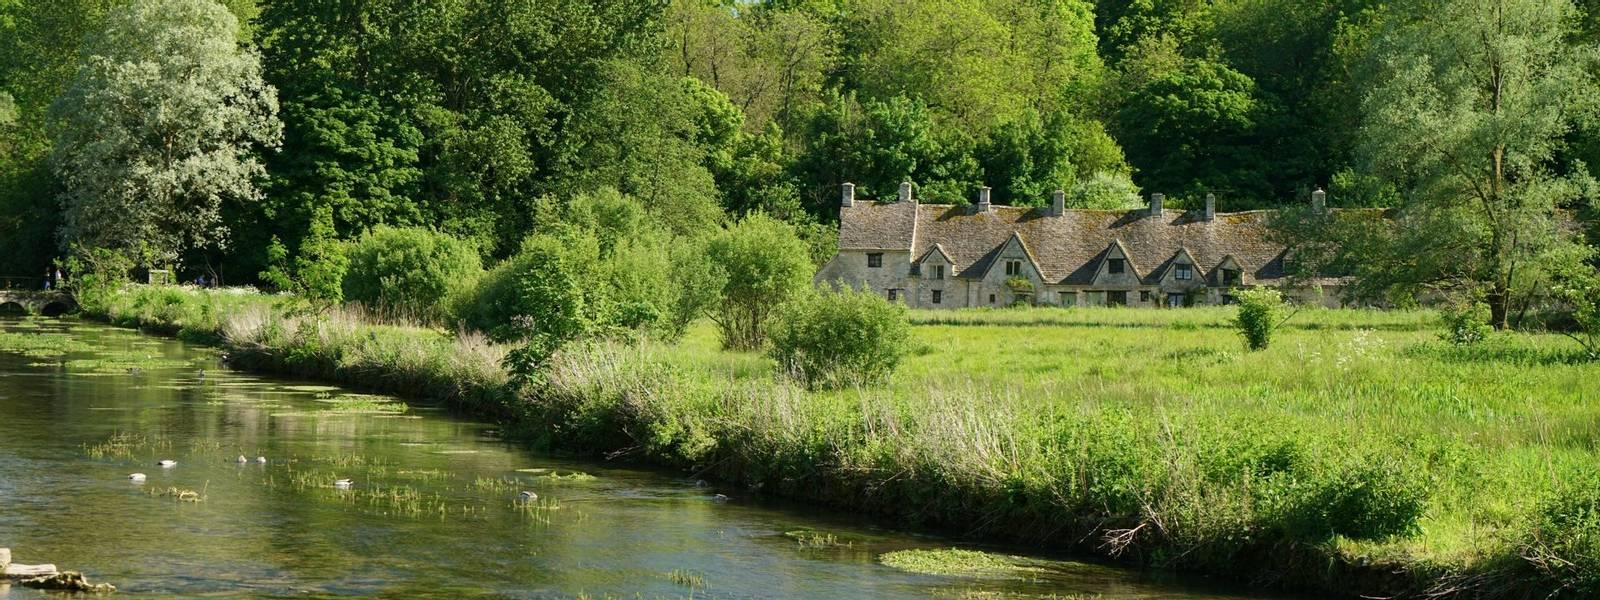 Cotswolds_Bibury_River_Coln_AdobeStock_158240335.jpeg